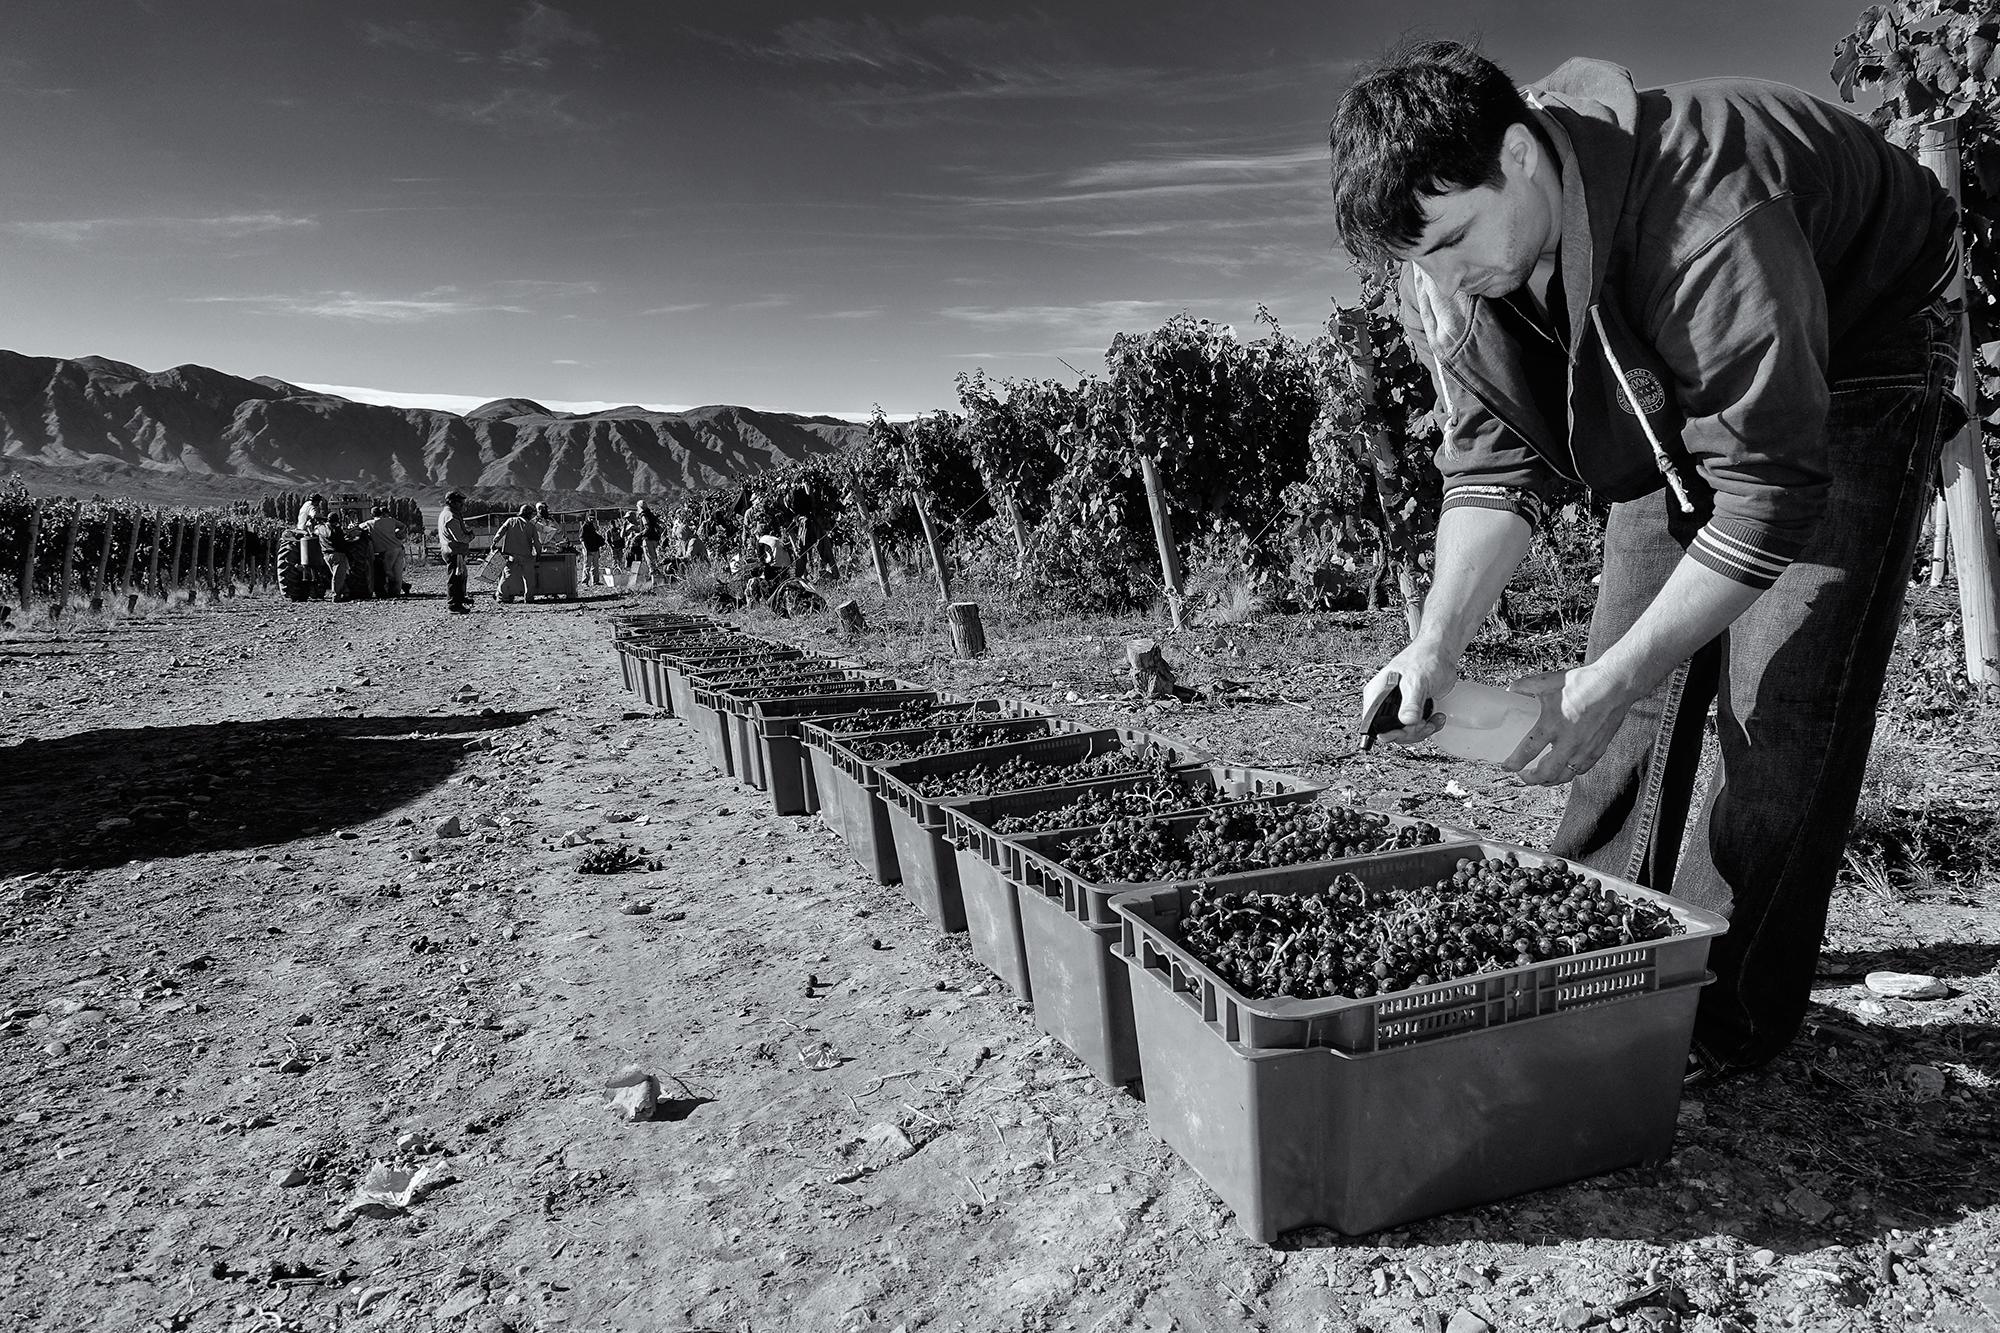 Disinfecting. El Valle del Pedernal, San Juan, Argentina, 2016